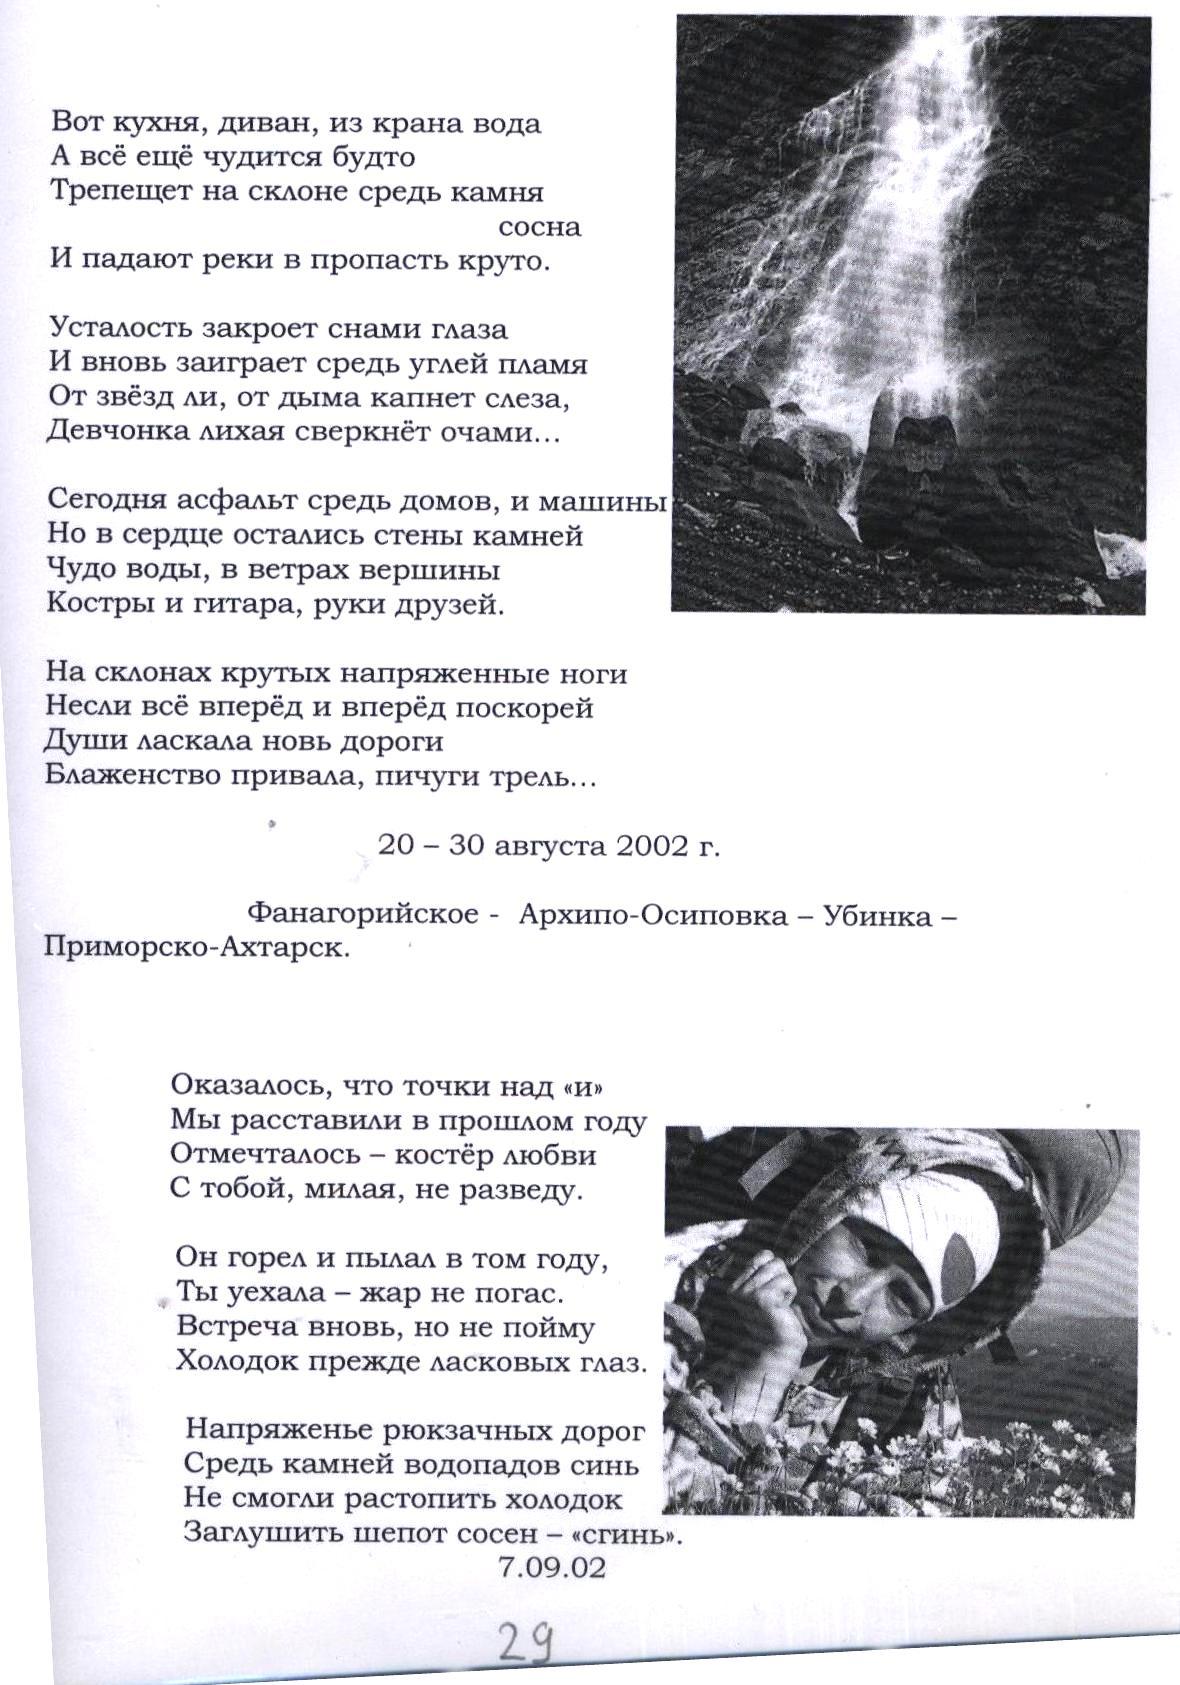 Стихи 028.jpg